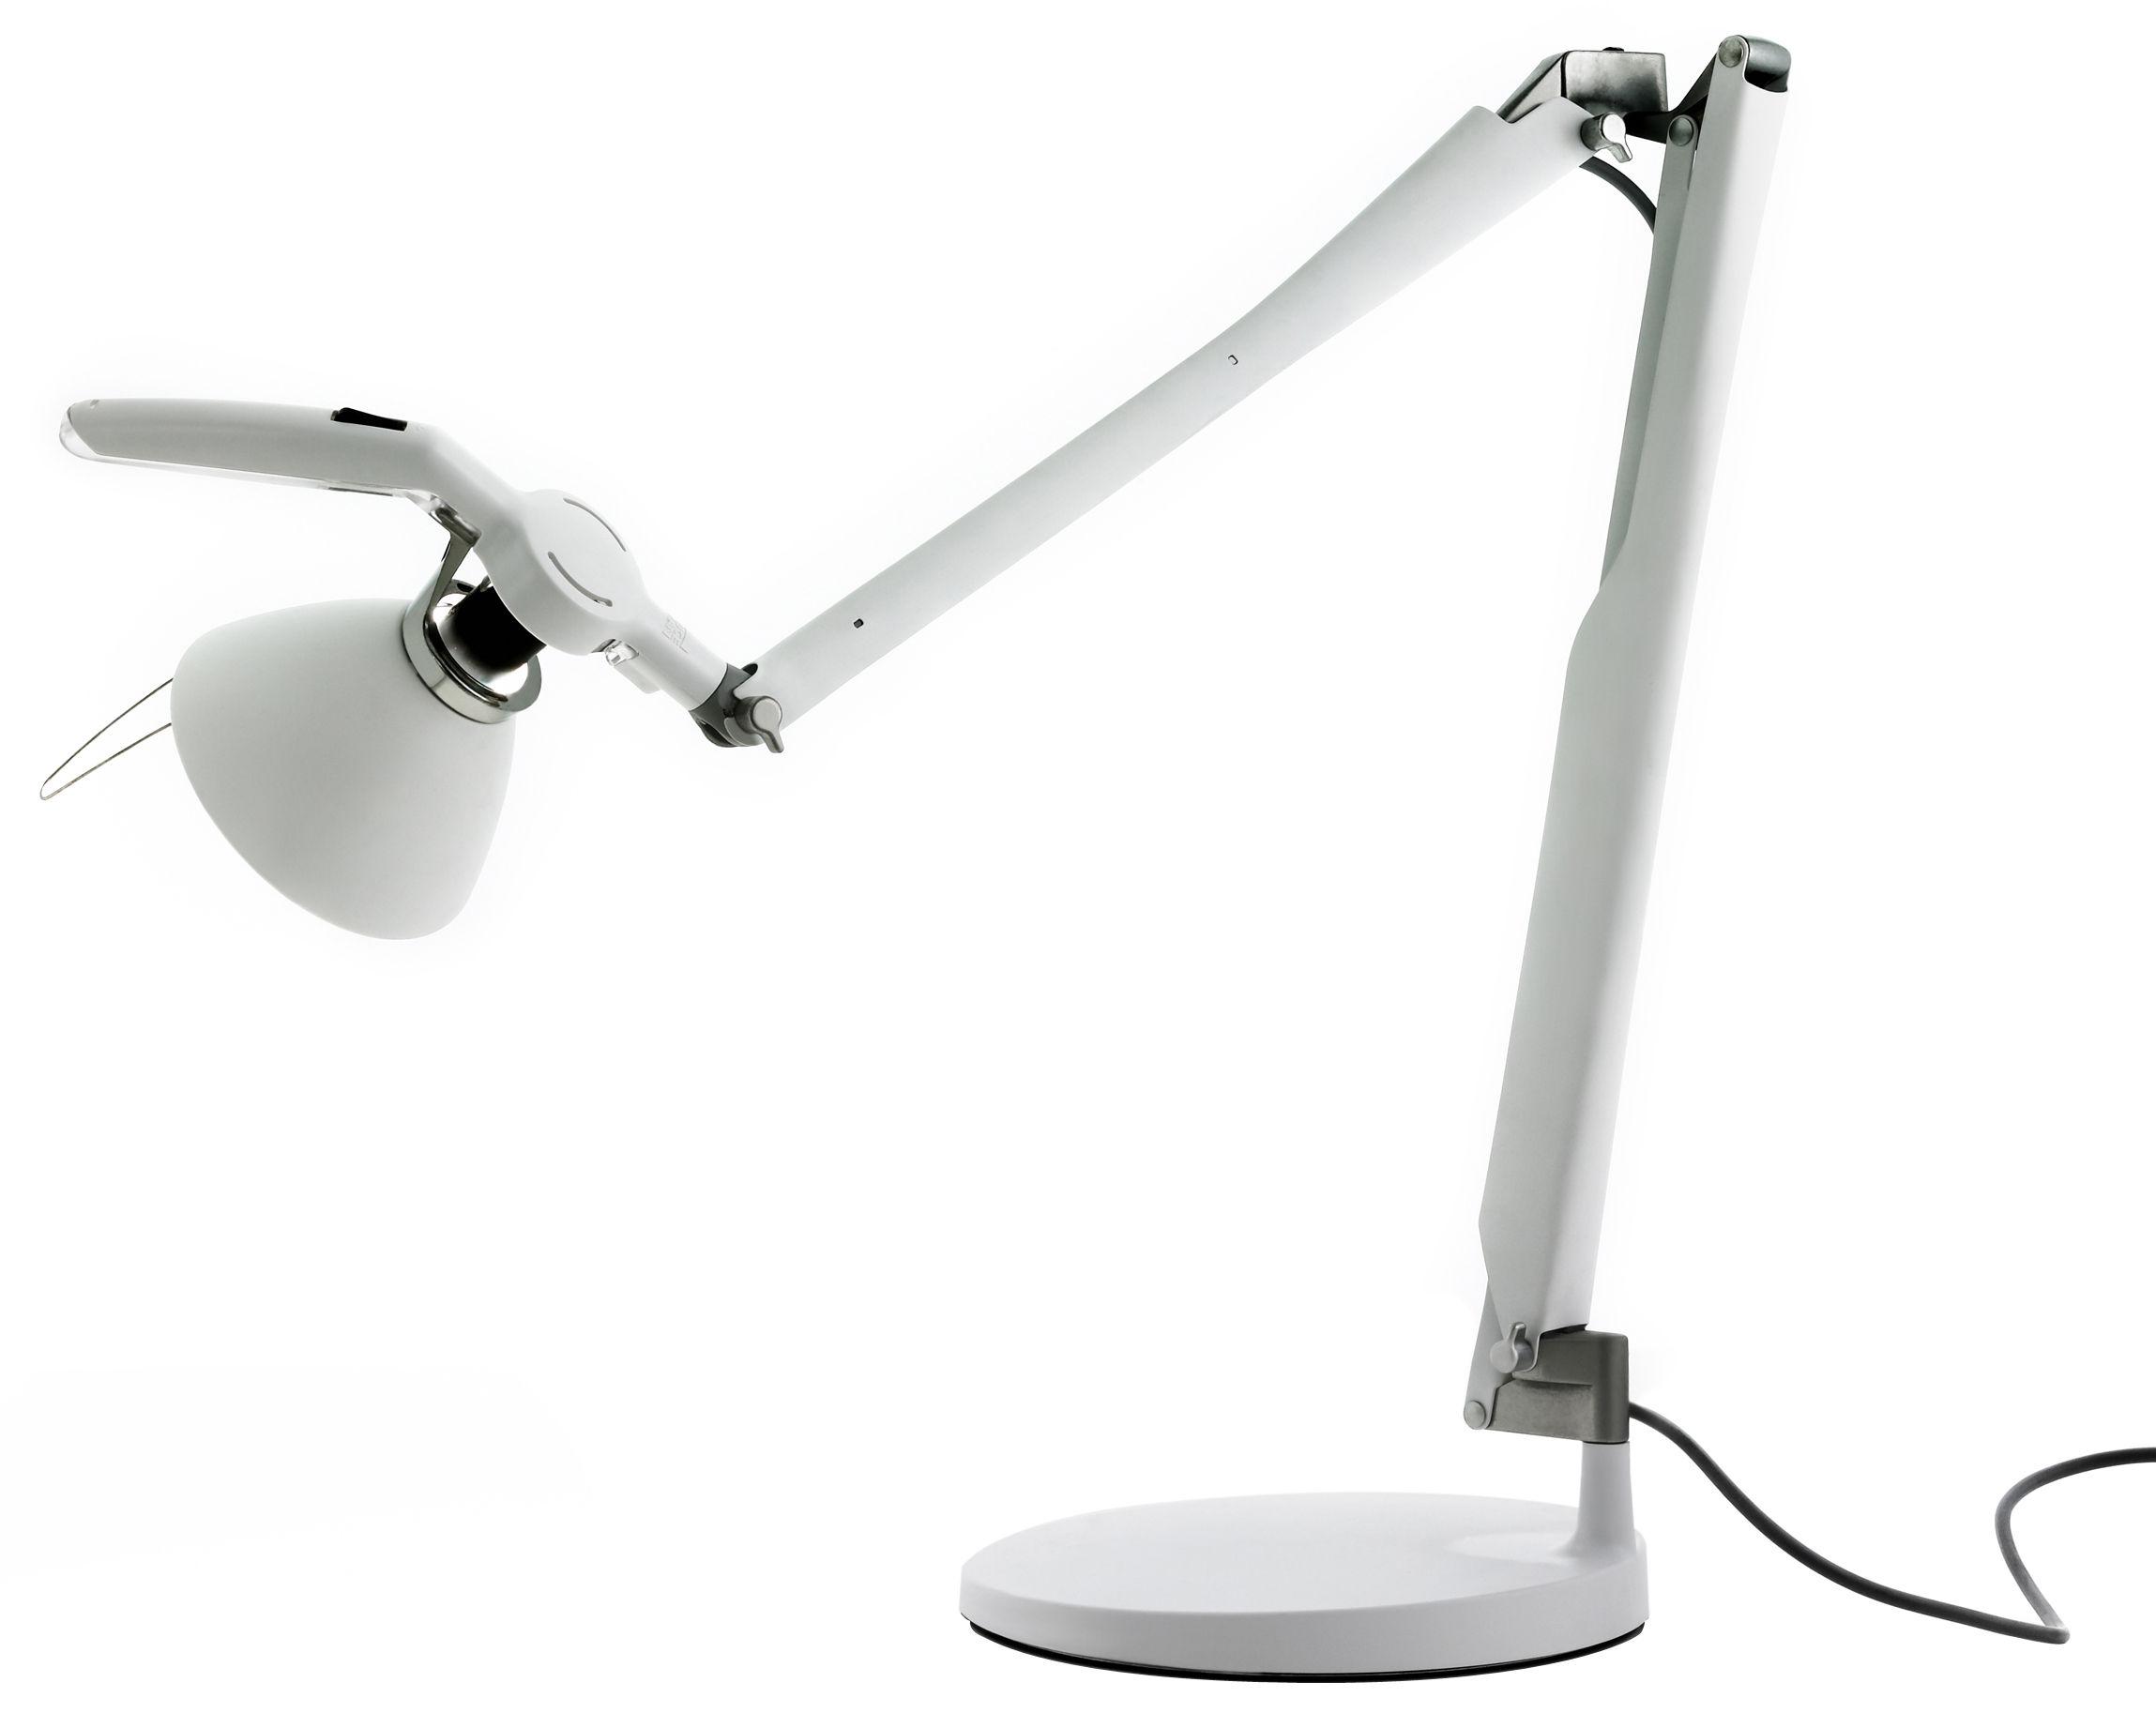 Luminaire - Lampes de table - Lampe de table Fortebraccio interrupteur - Luceplan - Blanc - Acier verni